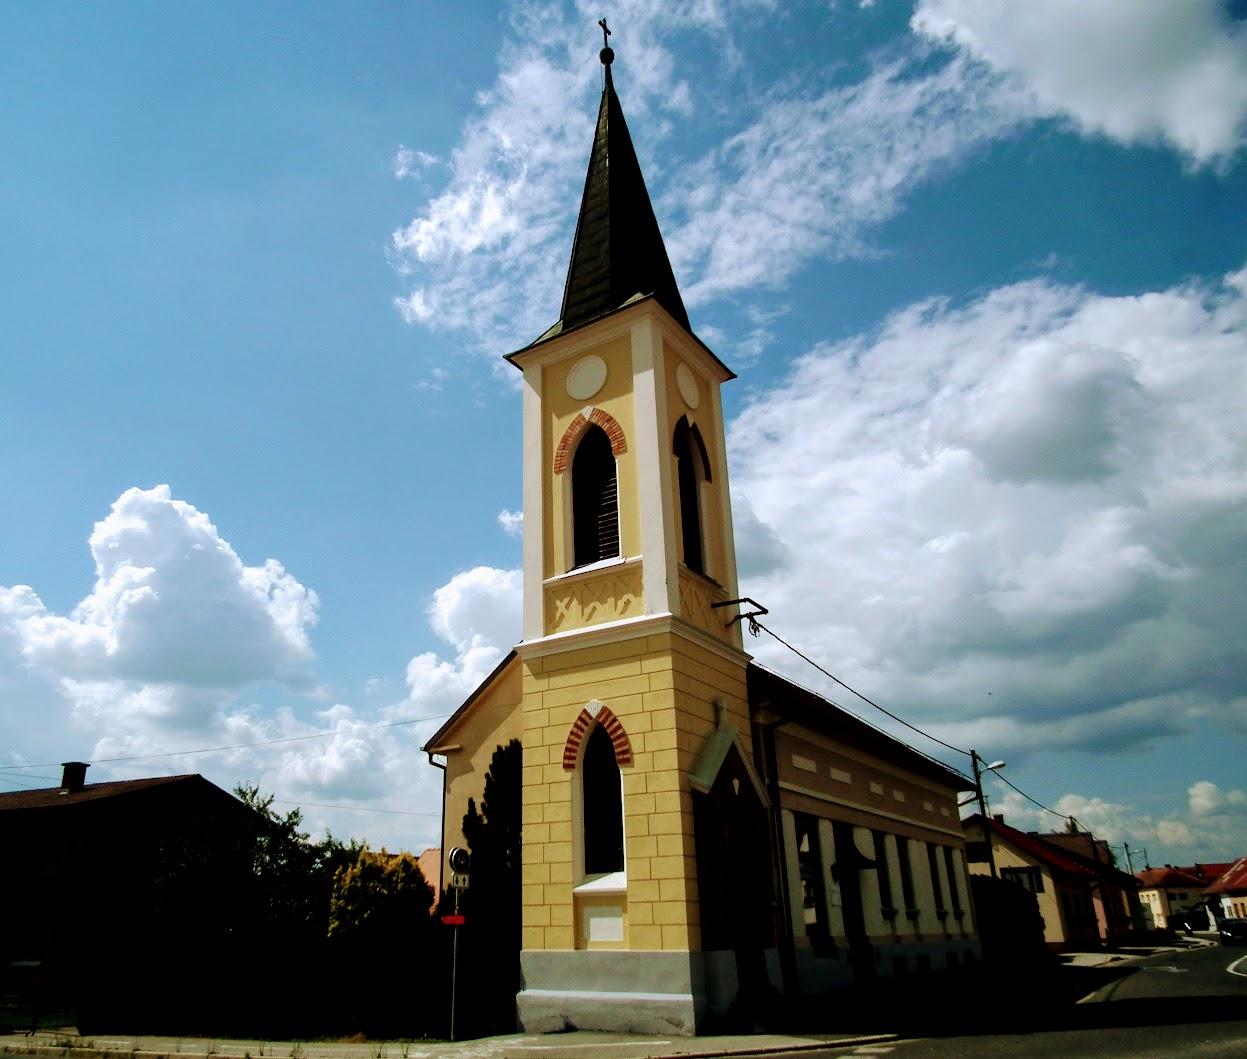 Martjanci (Mártonhely) - Martjanci (Mártonhely) - Škrabanova hiša z zvonikom (Škraban-ház, evangélikus harangtorony)